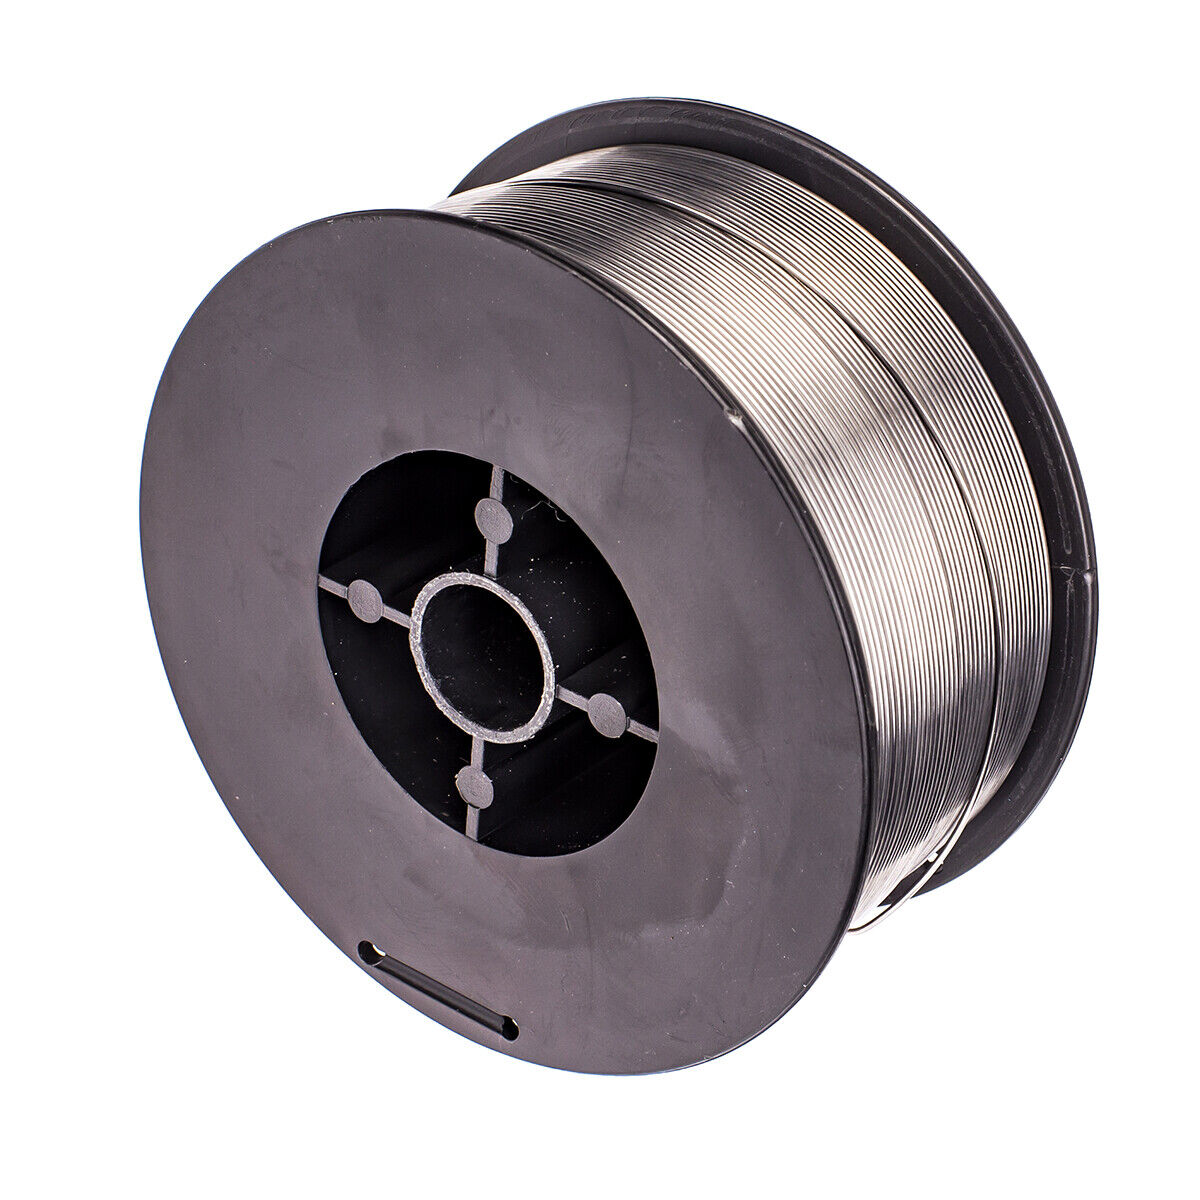 S-G08W1 Gasless Welding Wire MIG 0.8mm Flux Cored 1.0kg Reel AWS A5.20 E71T-GS